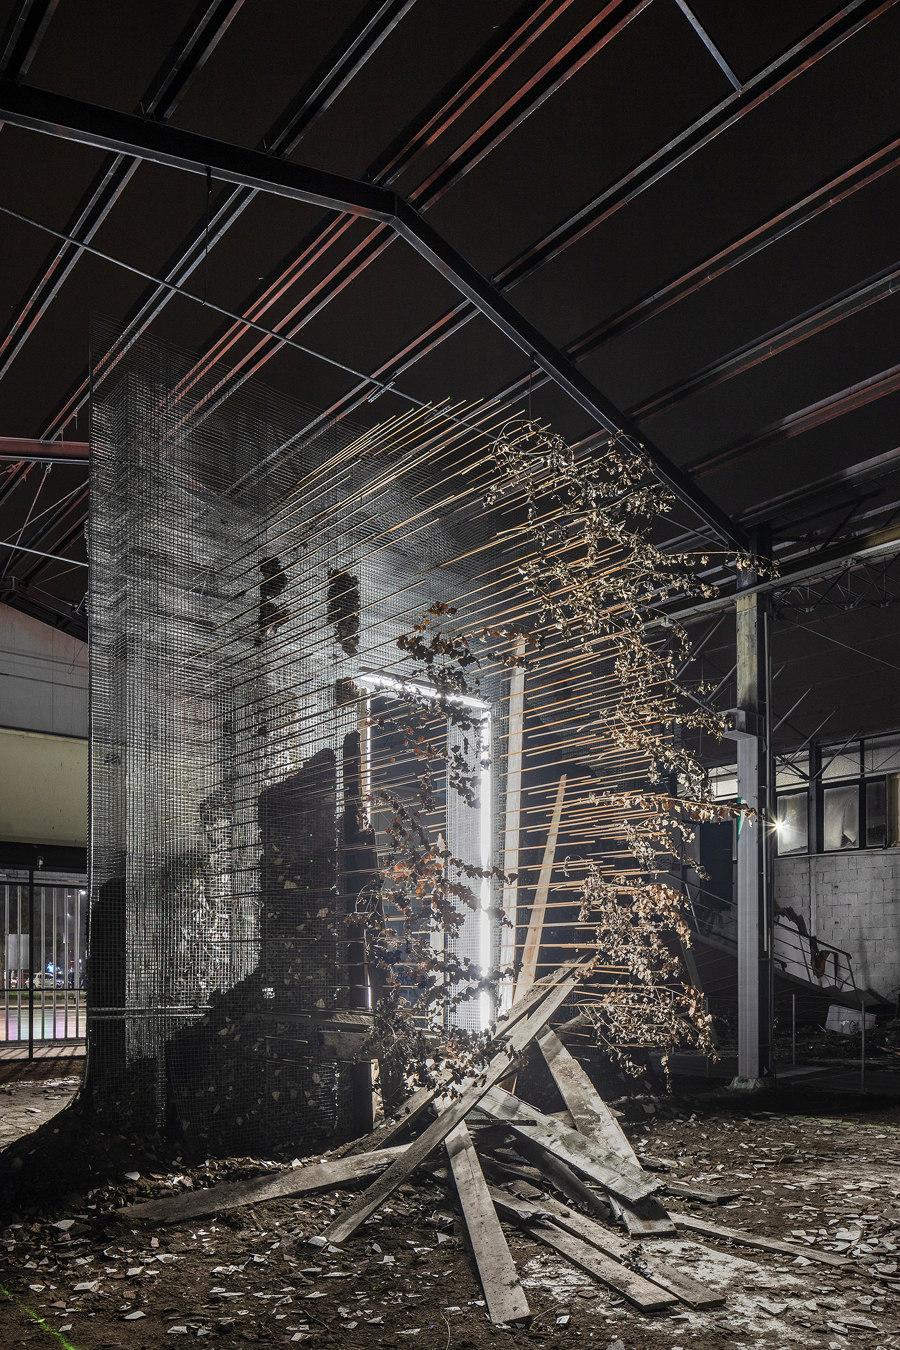 Cerimonia by TRAC - Tresoldi Academy   Installations